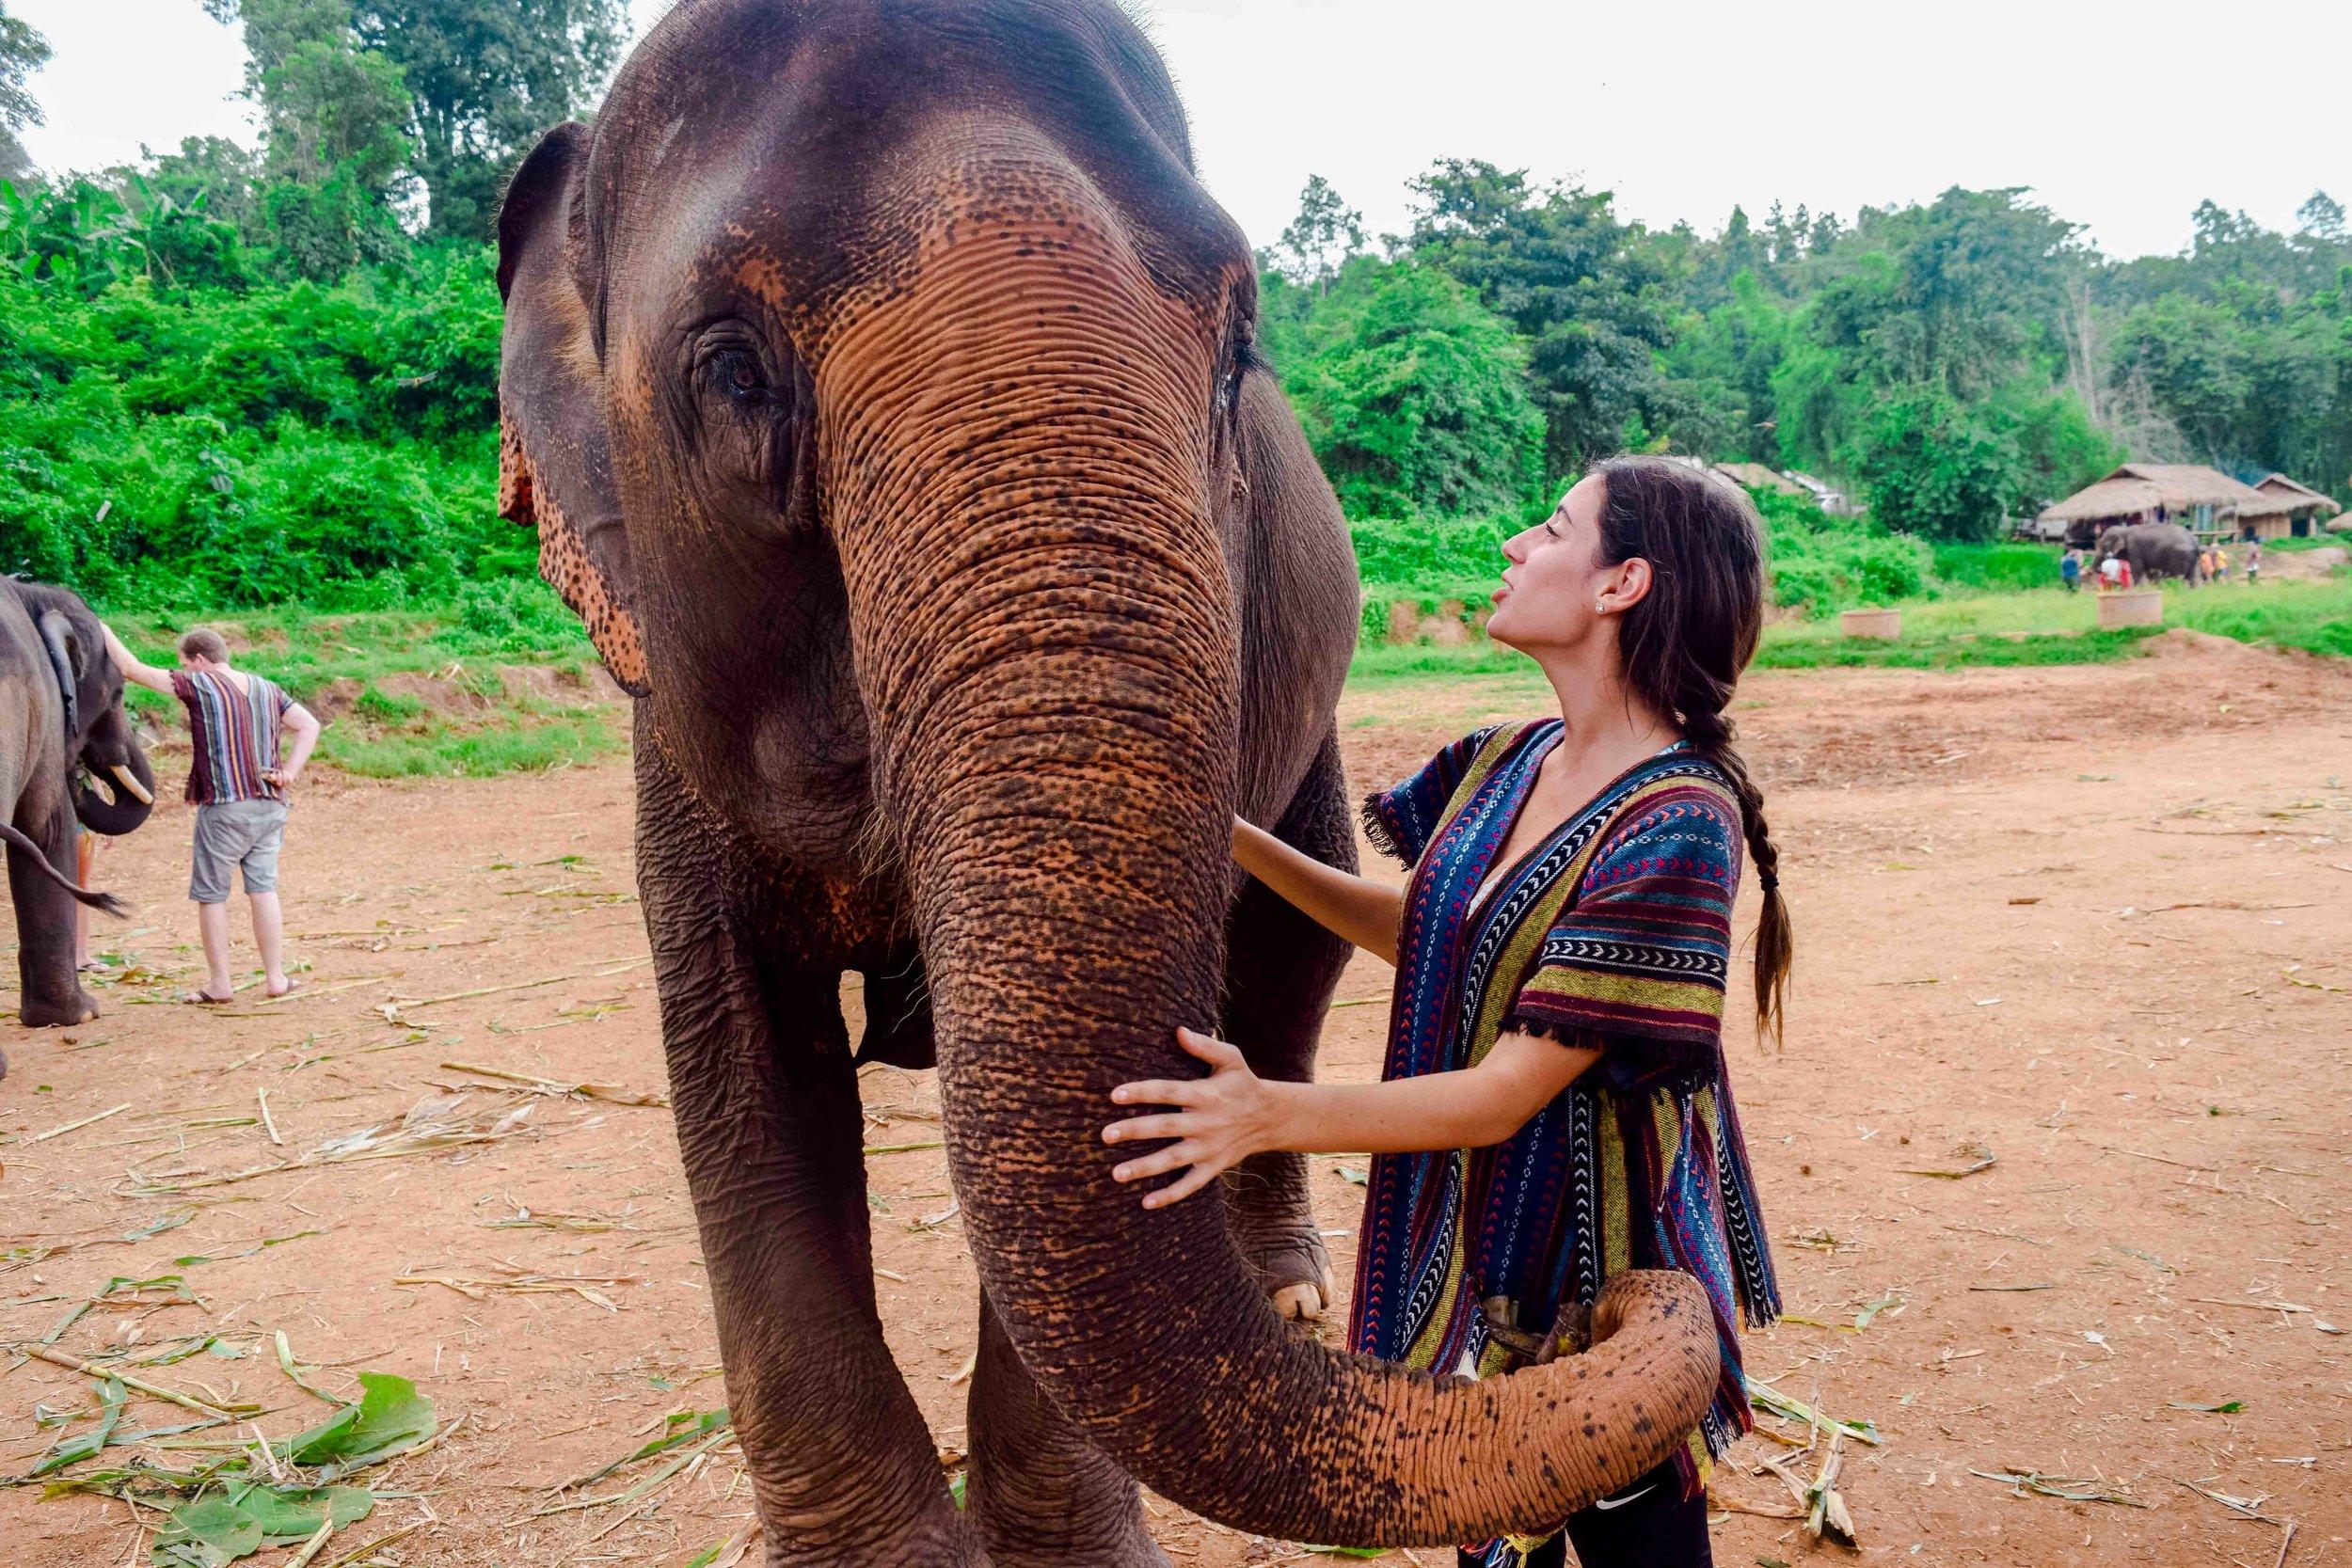 Chiang-Mai-Elephant-Tour-26.jpg